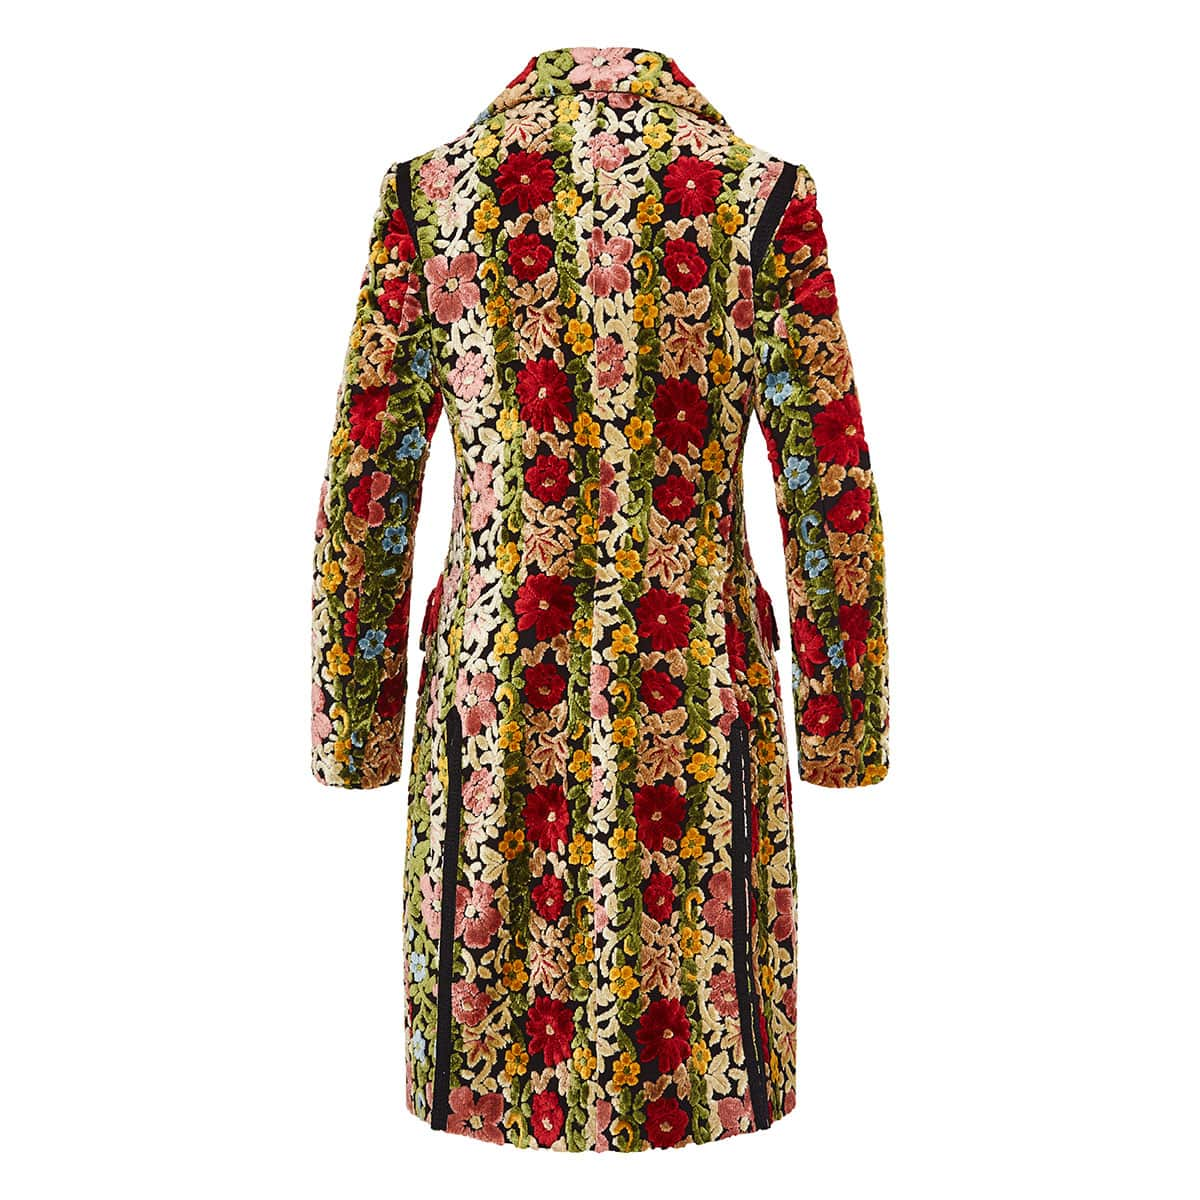 Carpet-embroidered floral coat